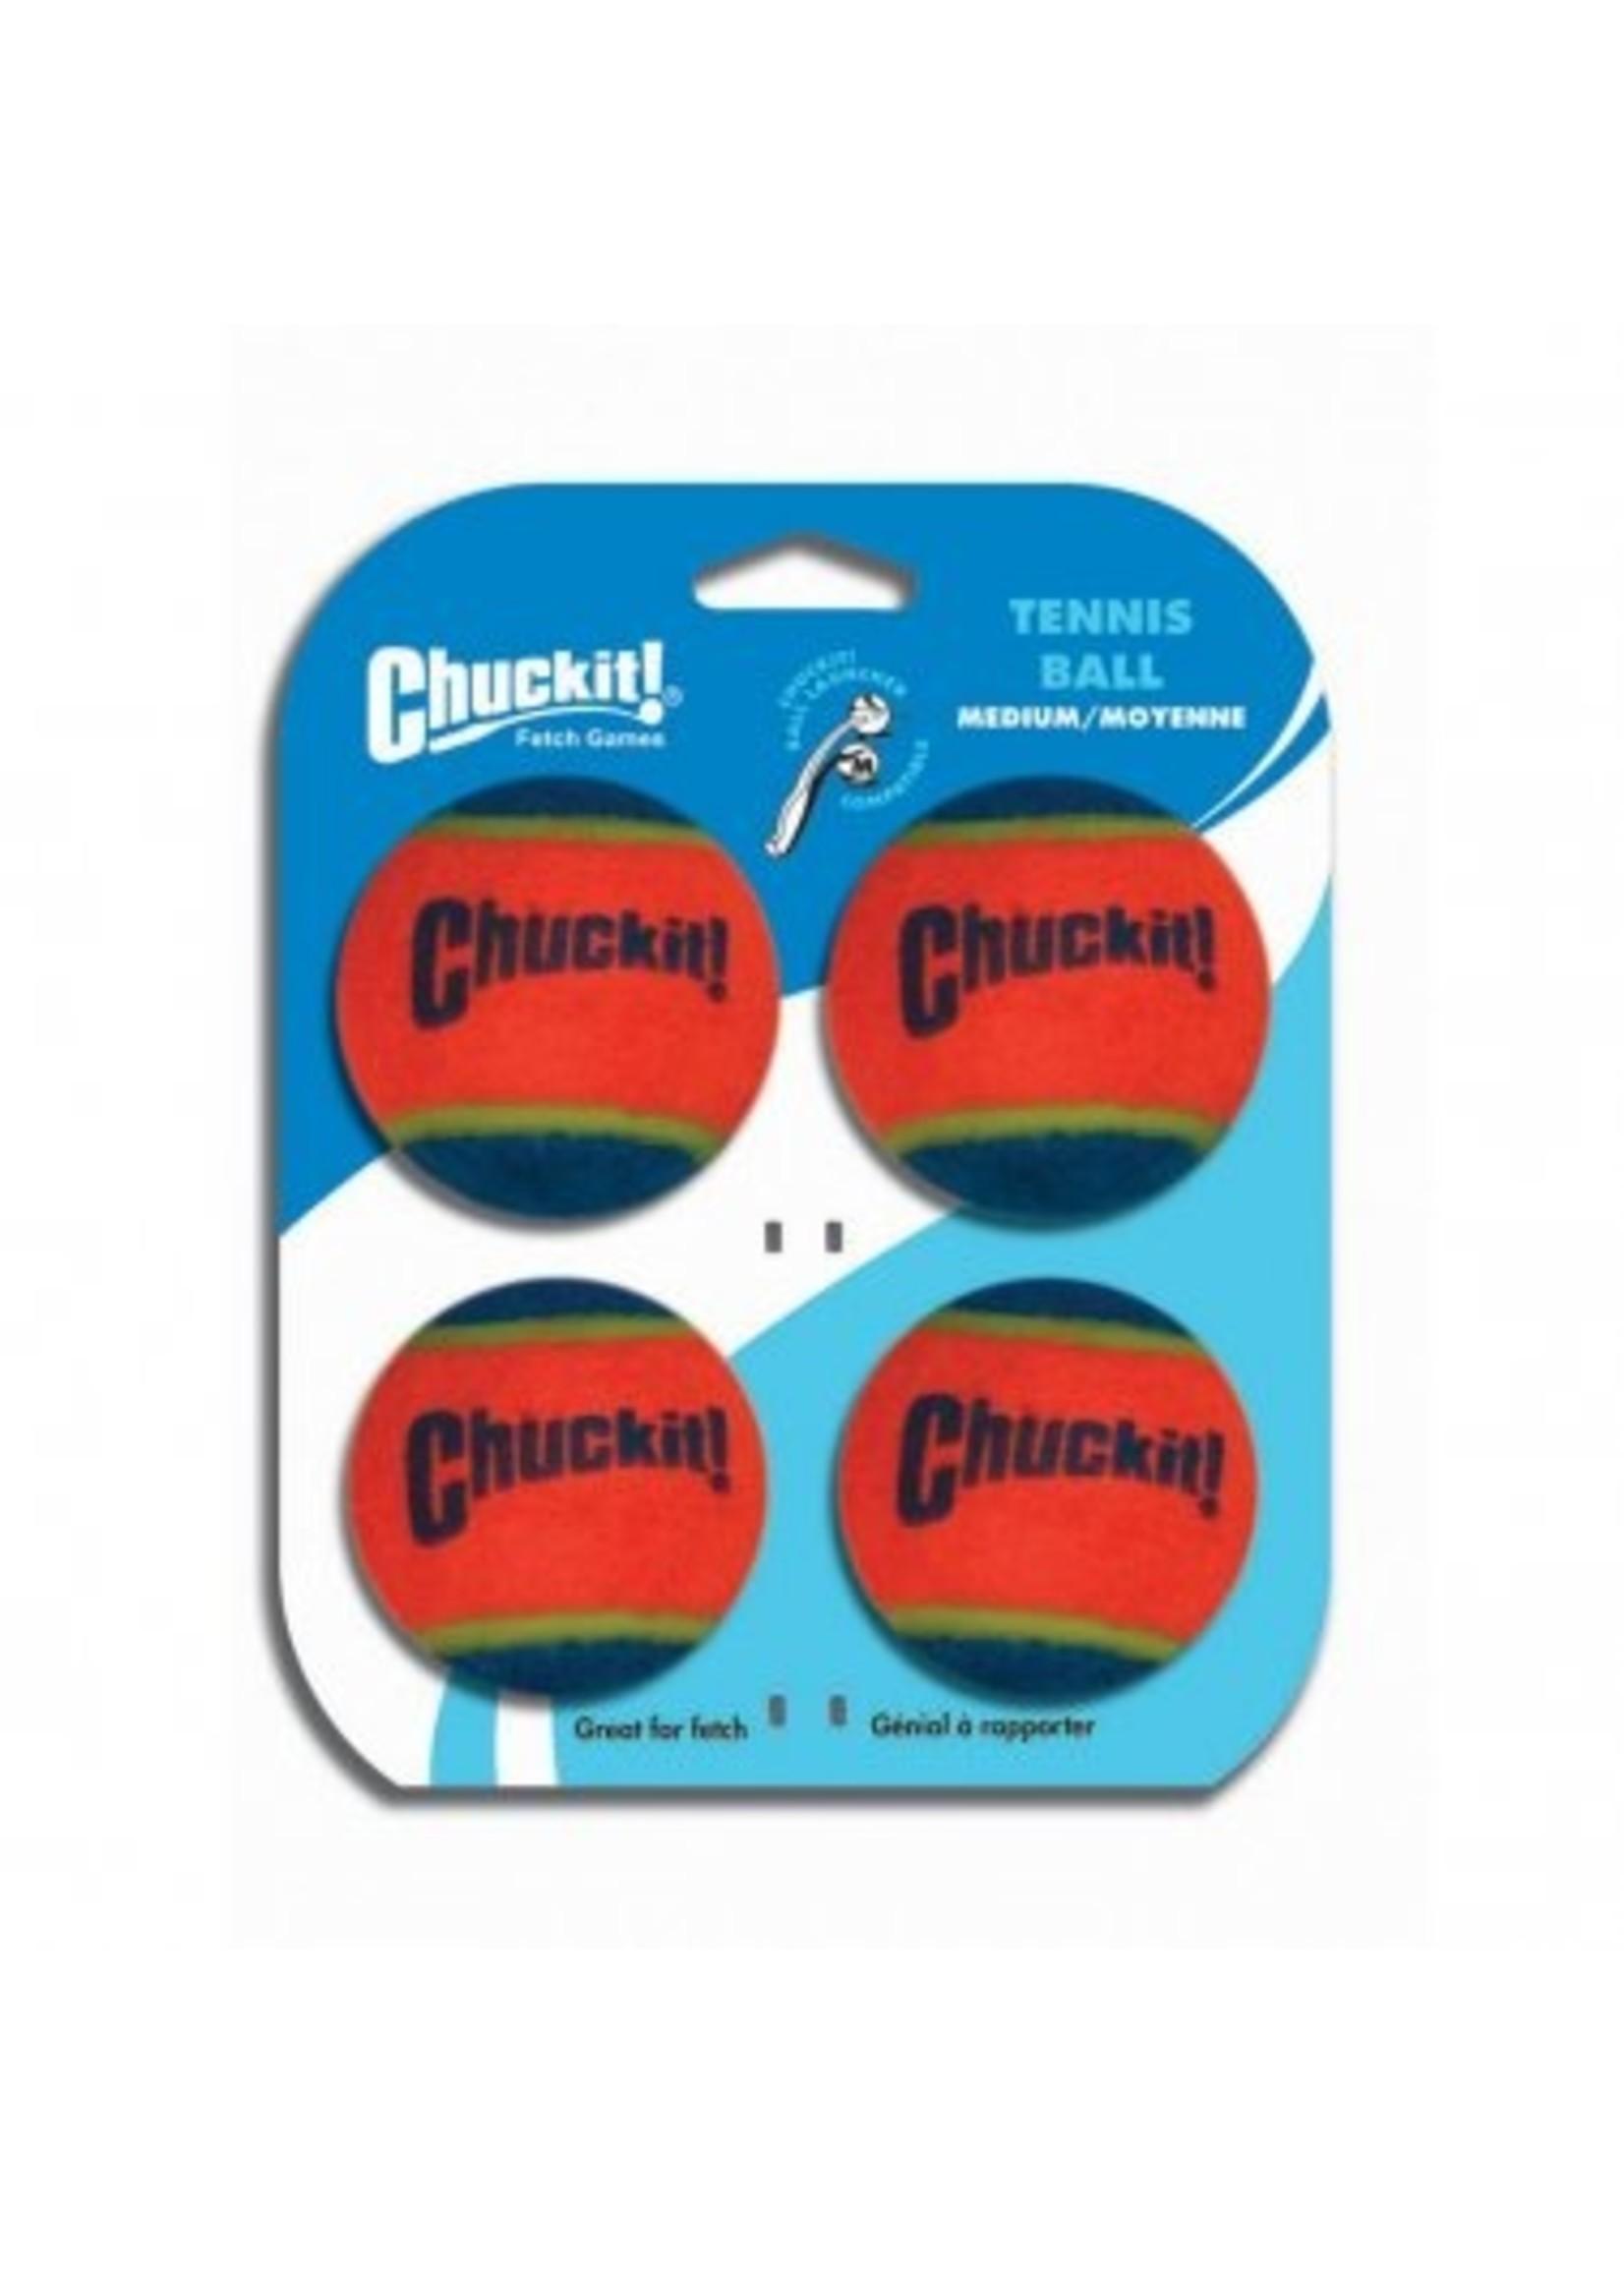 Chuckit!® Chuckit! Tennis Ball 4pk Md